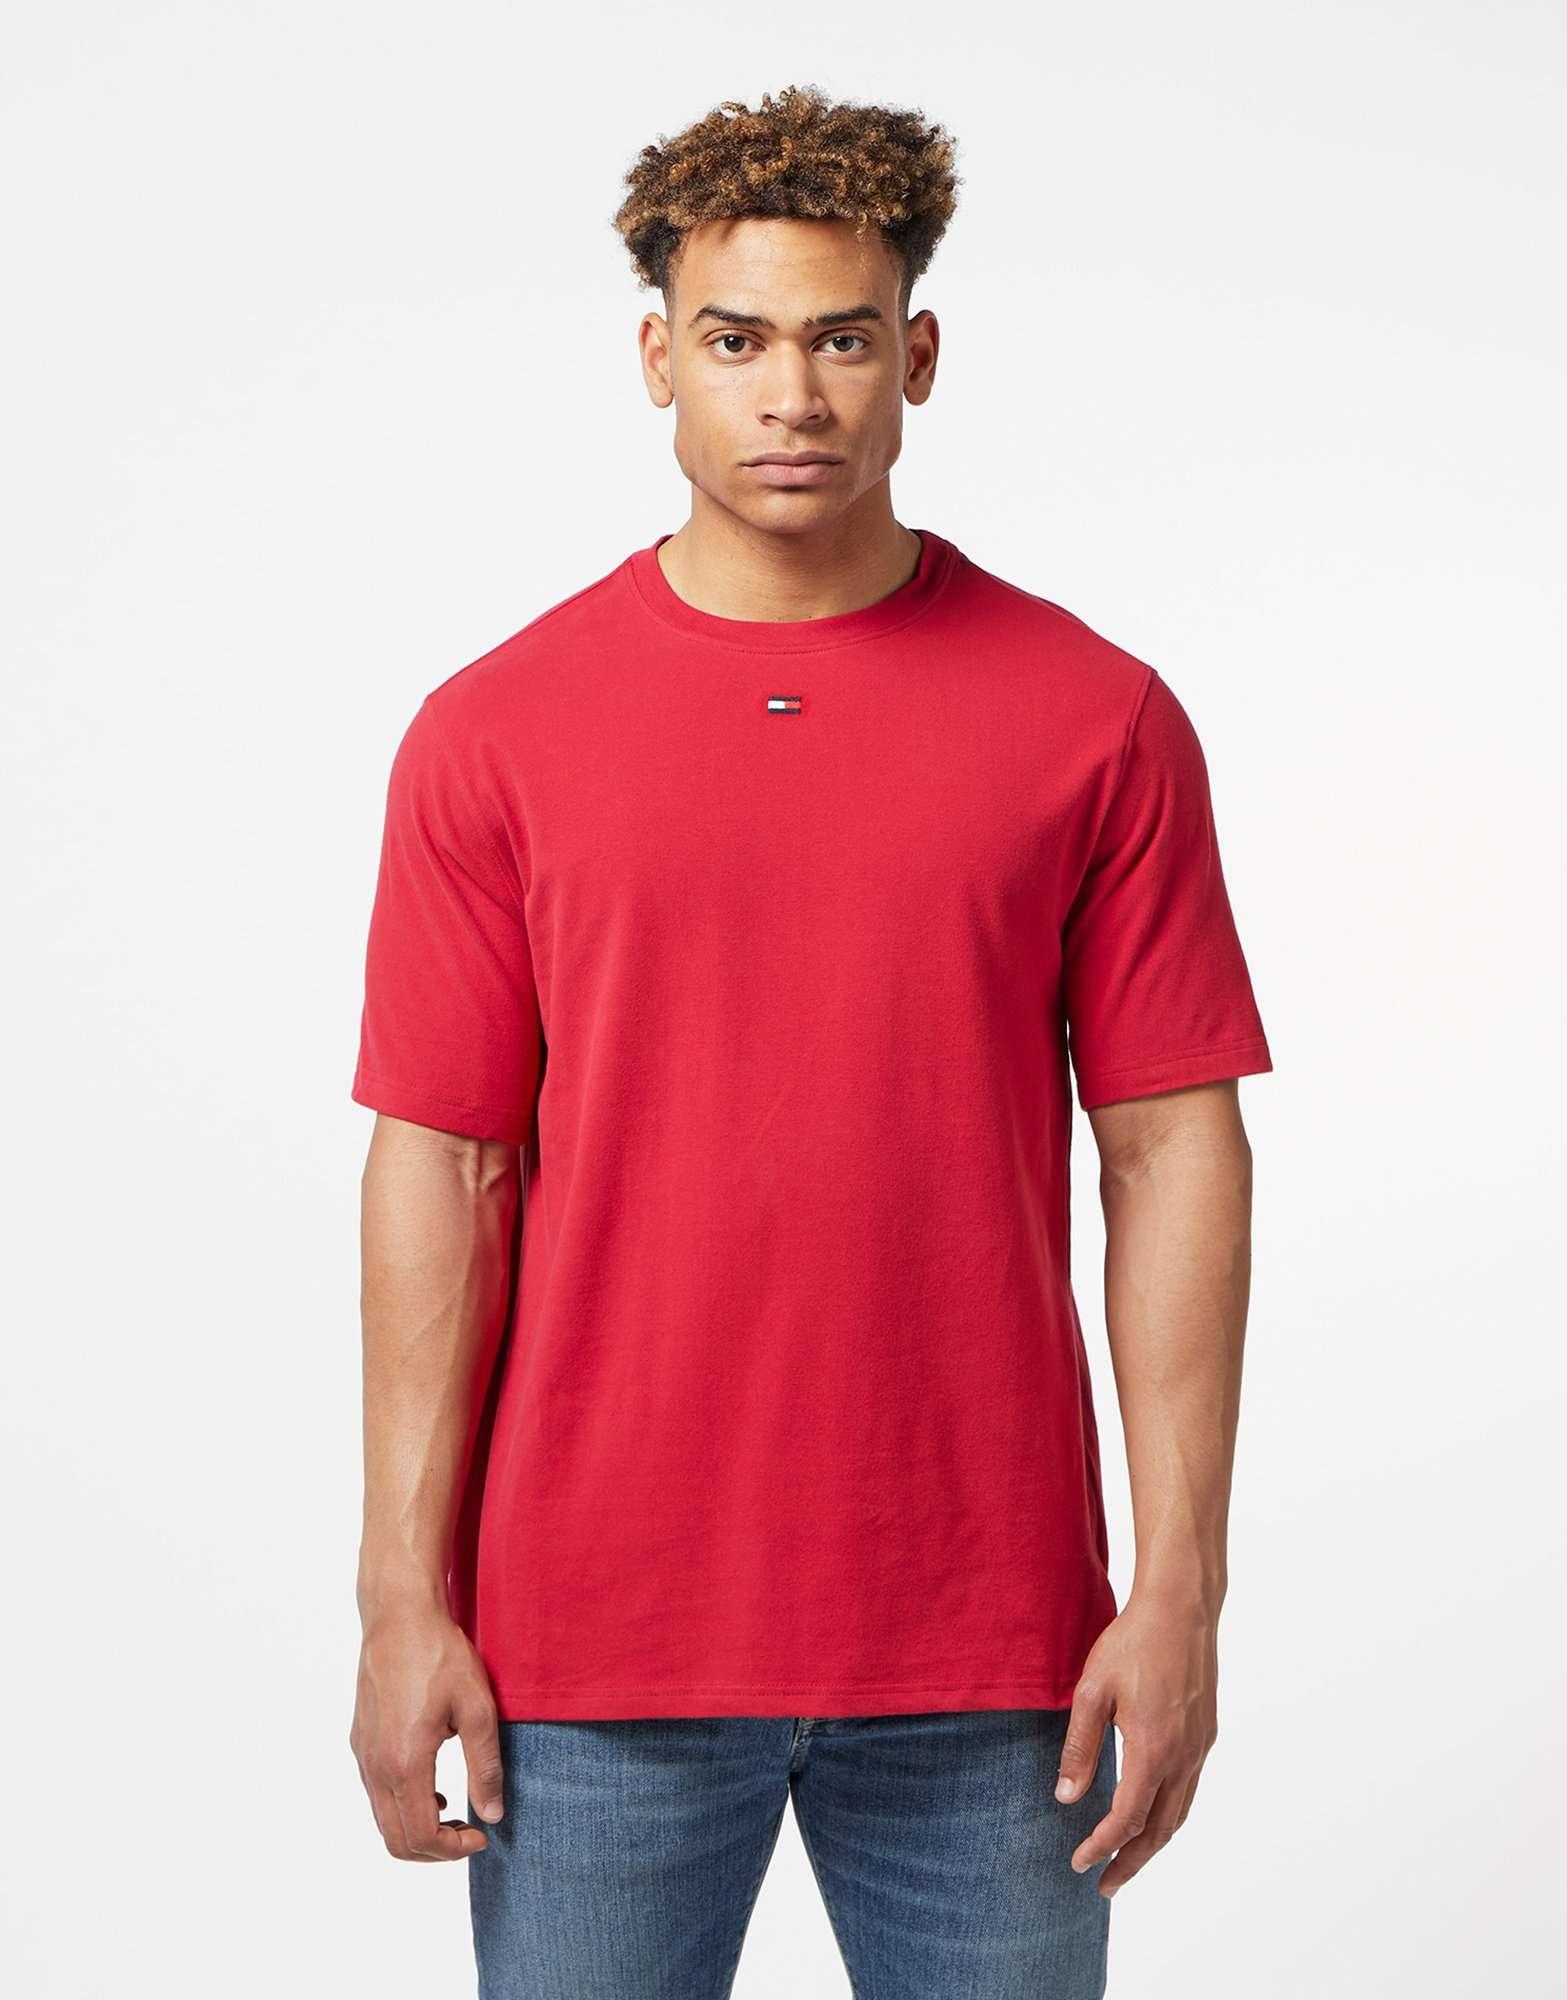 Tommy Hilfiger Centre Flag Short Sleeve T-Shirt